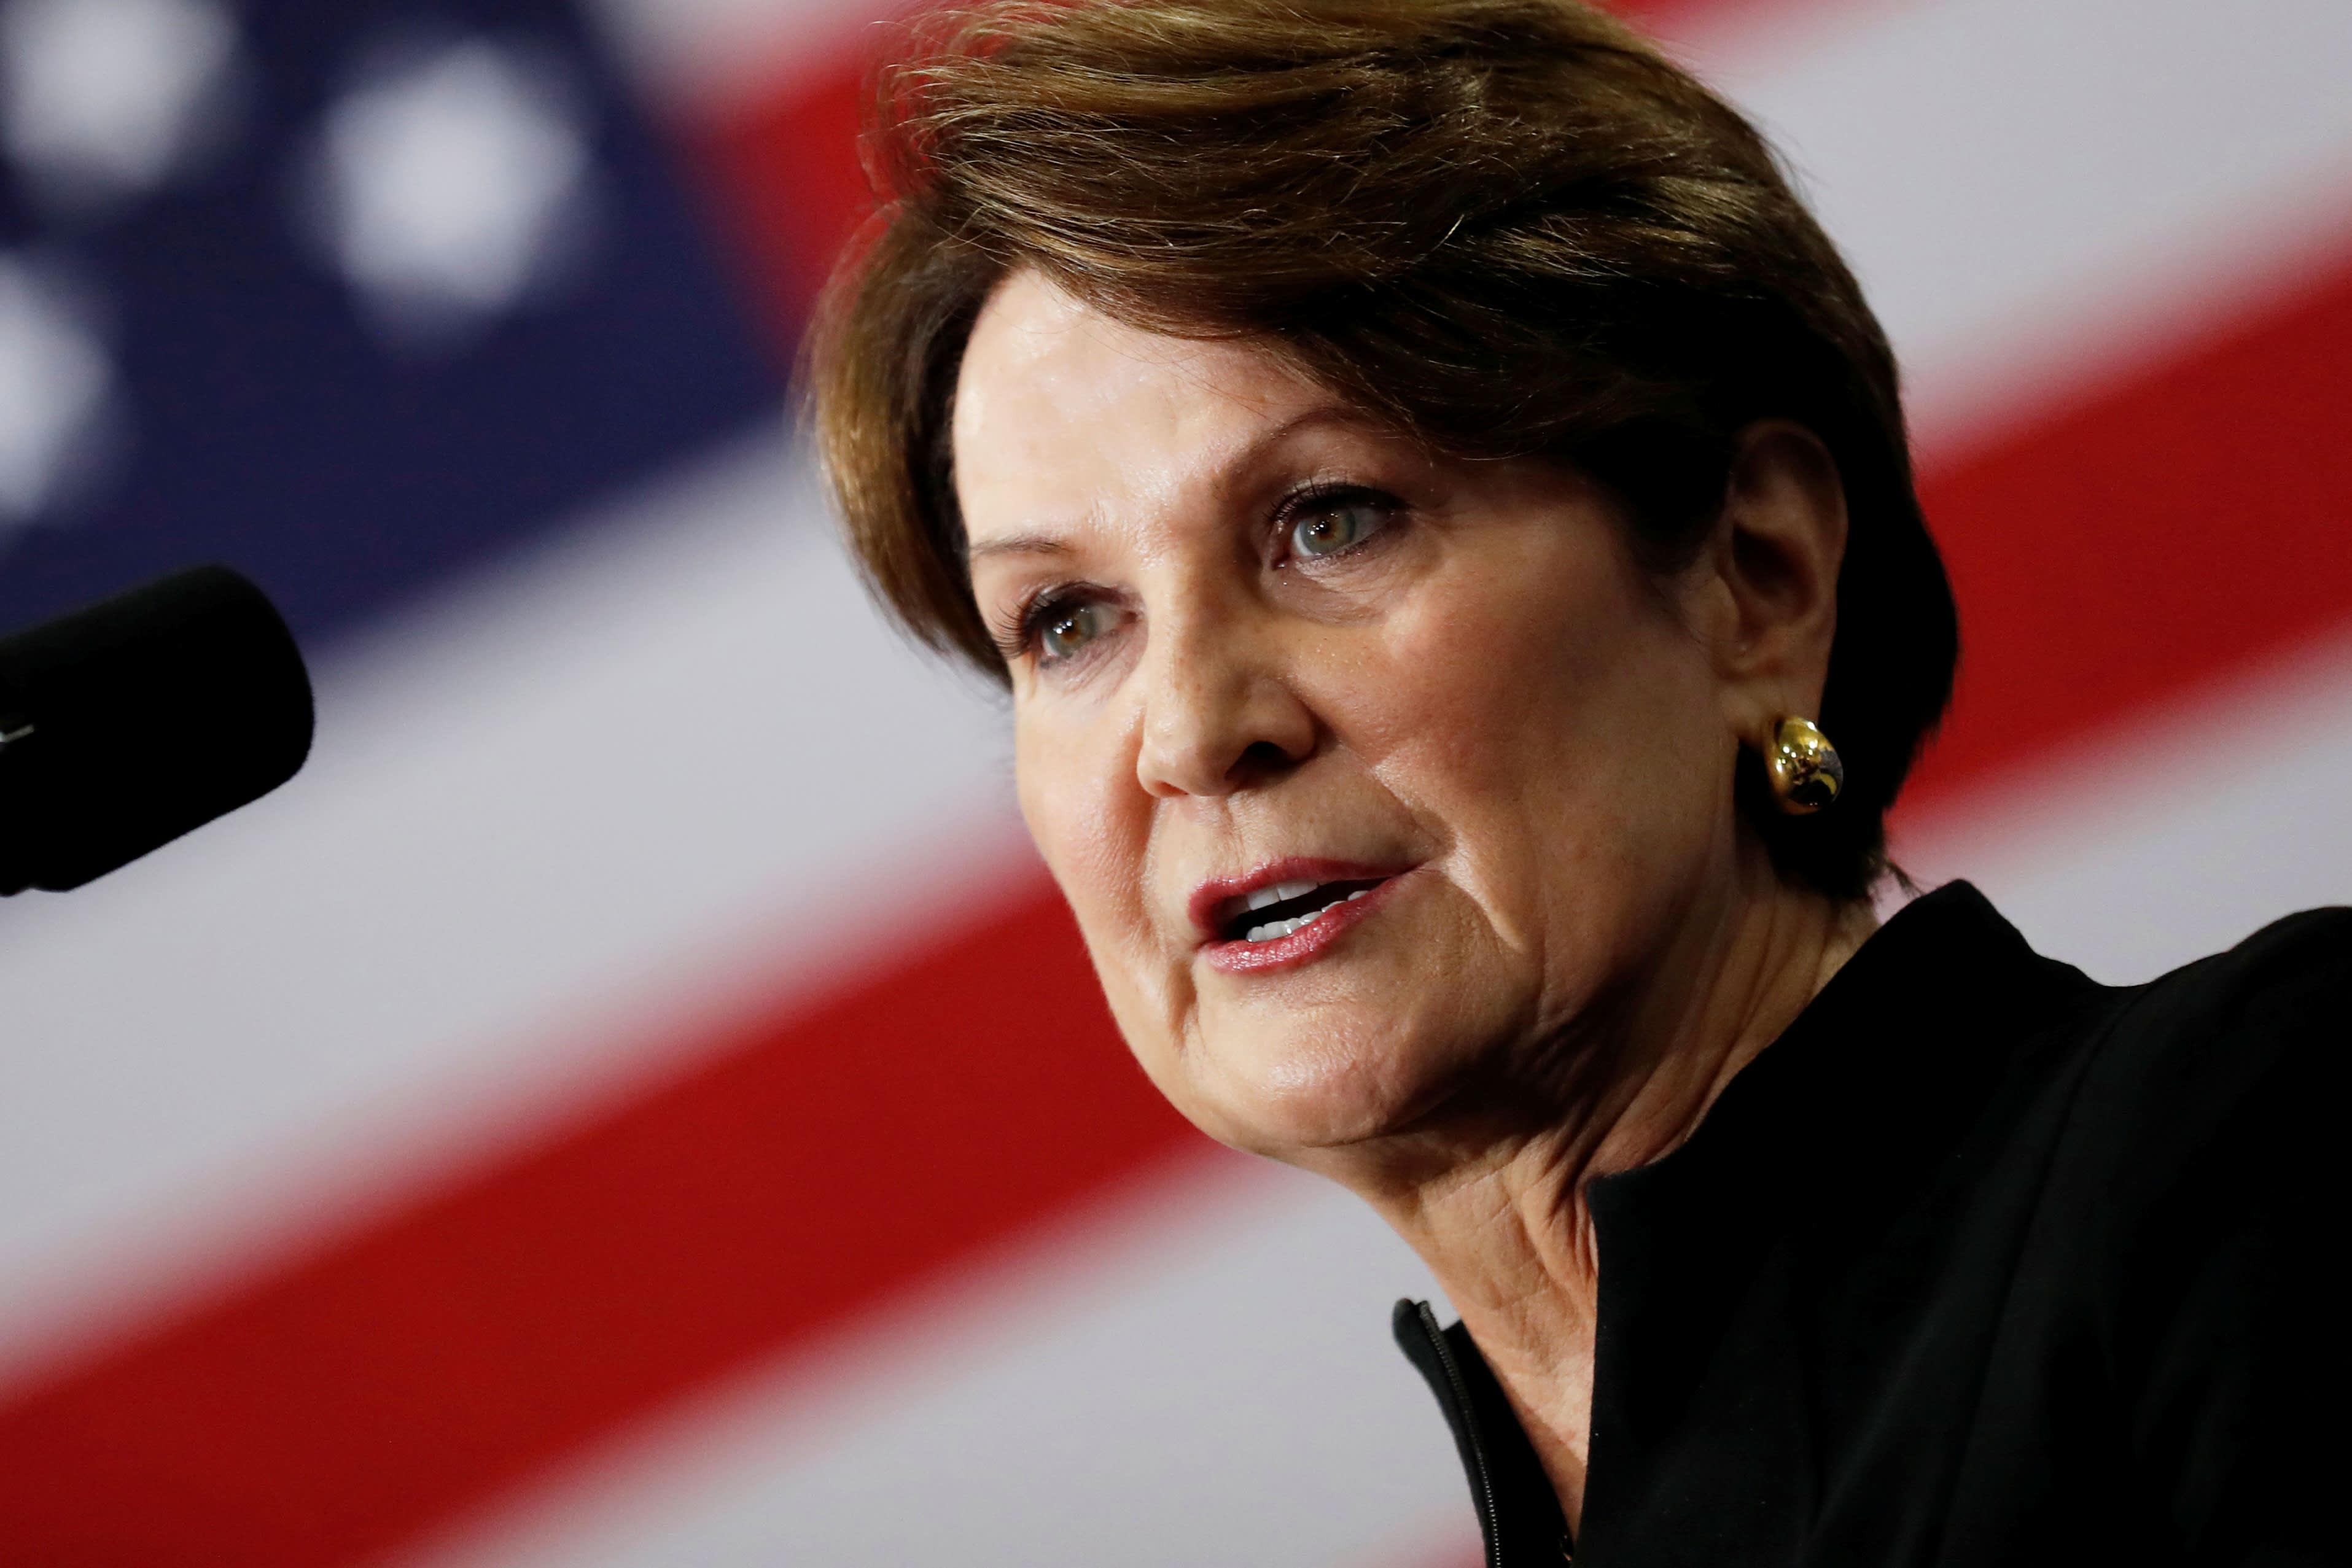 Lockheed Martin has become a stock market juggernaut under CEO Marillyn Hewson